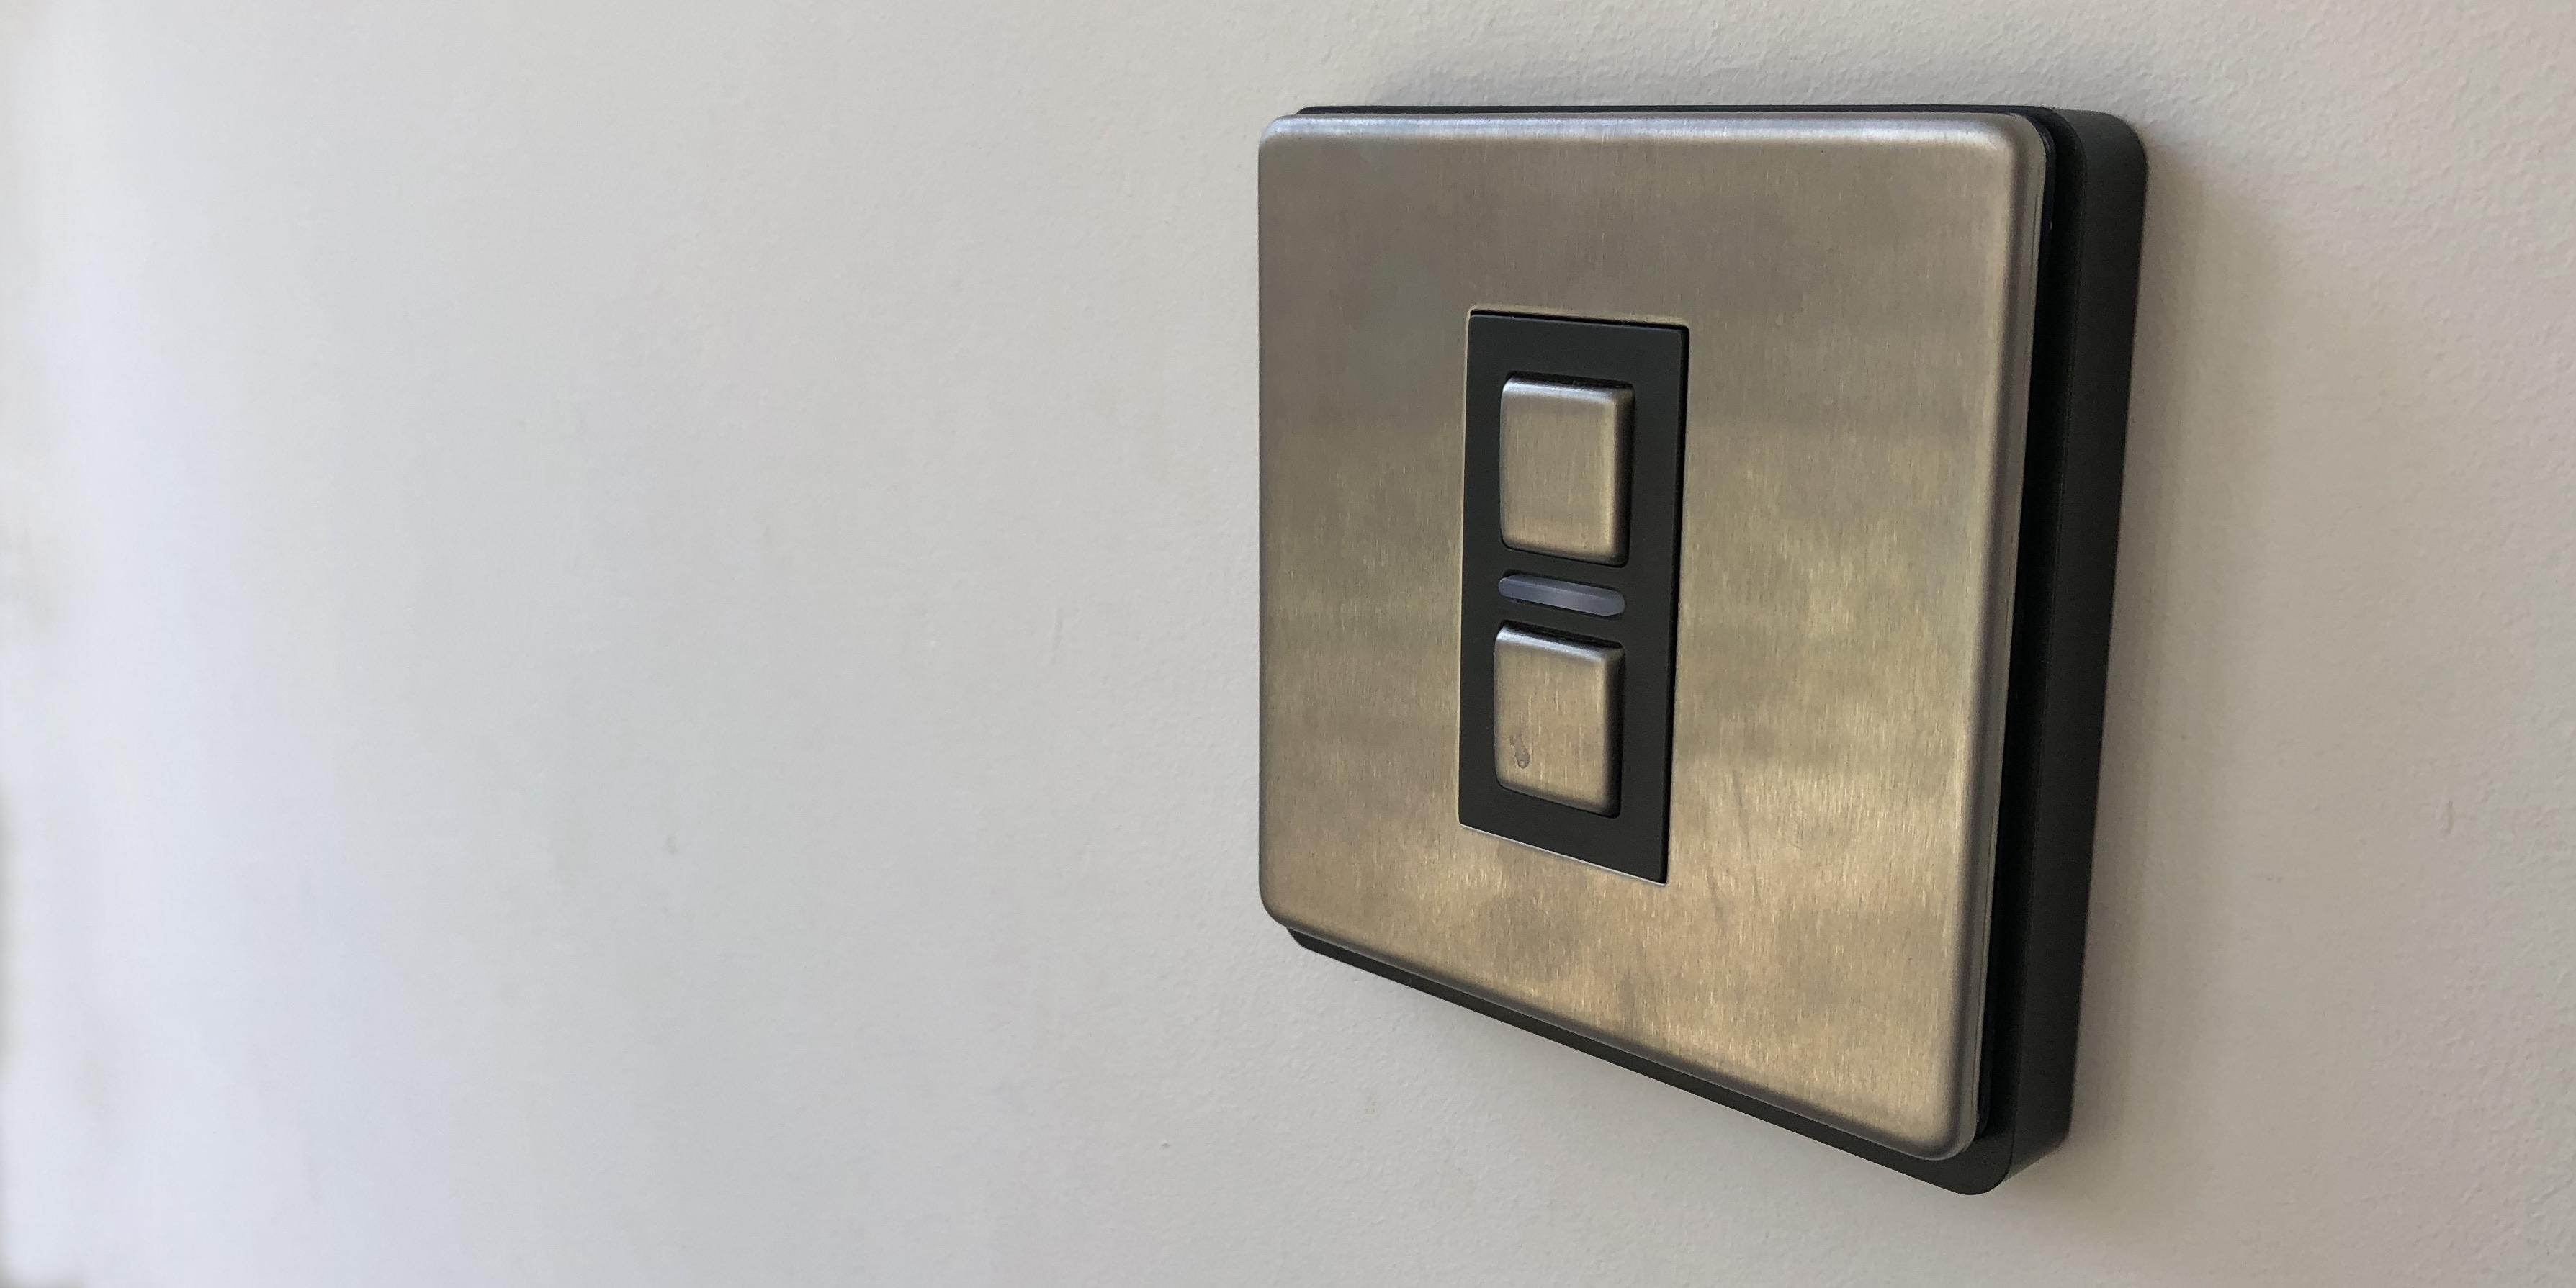 Review Lightwave Light Switch The Best Uk Homekit Solution For